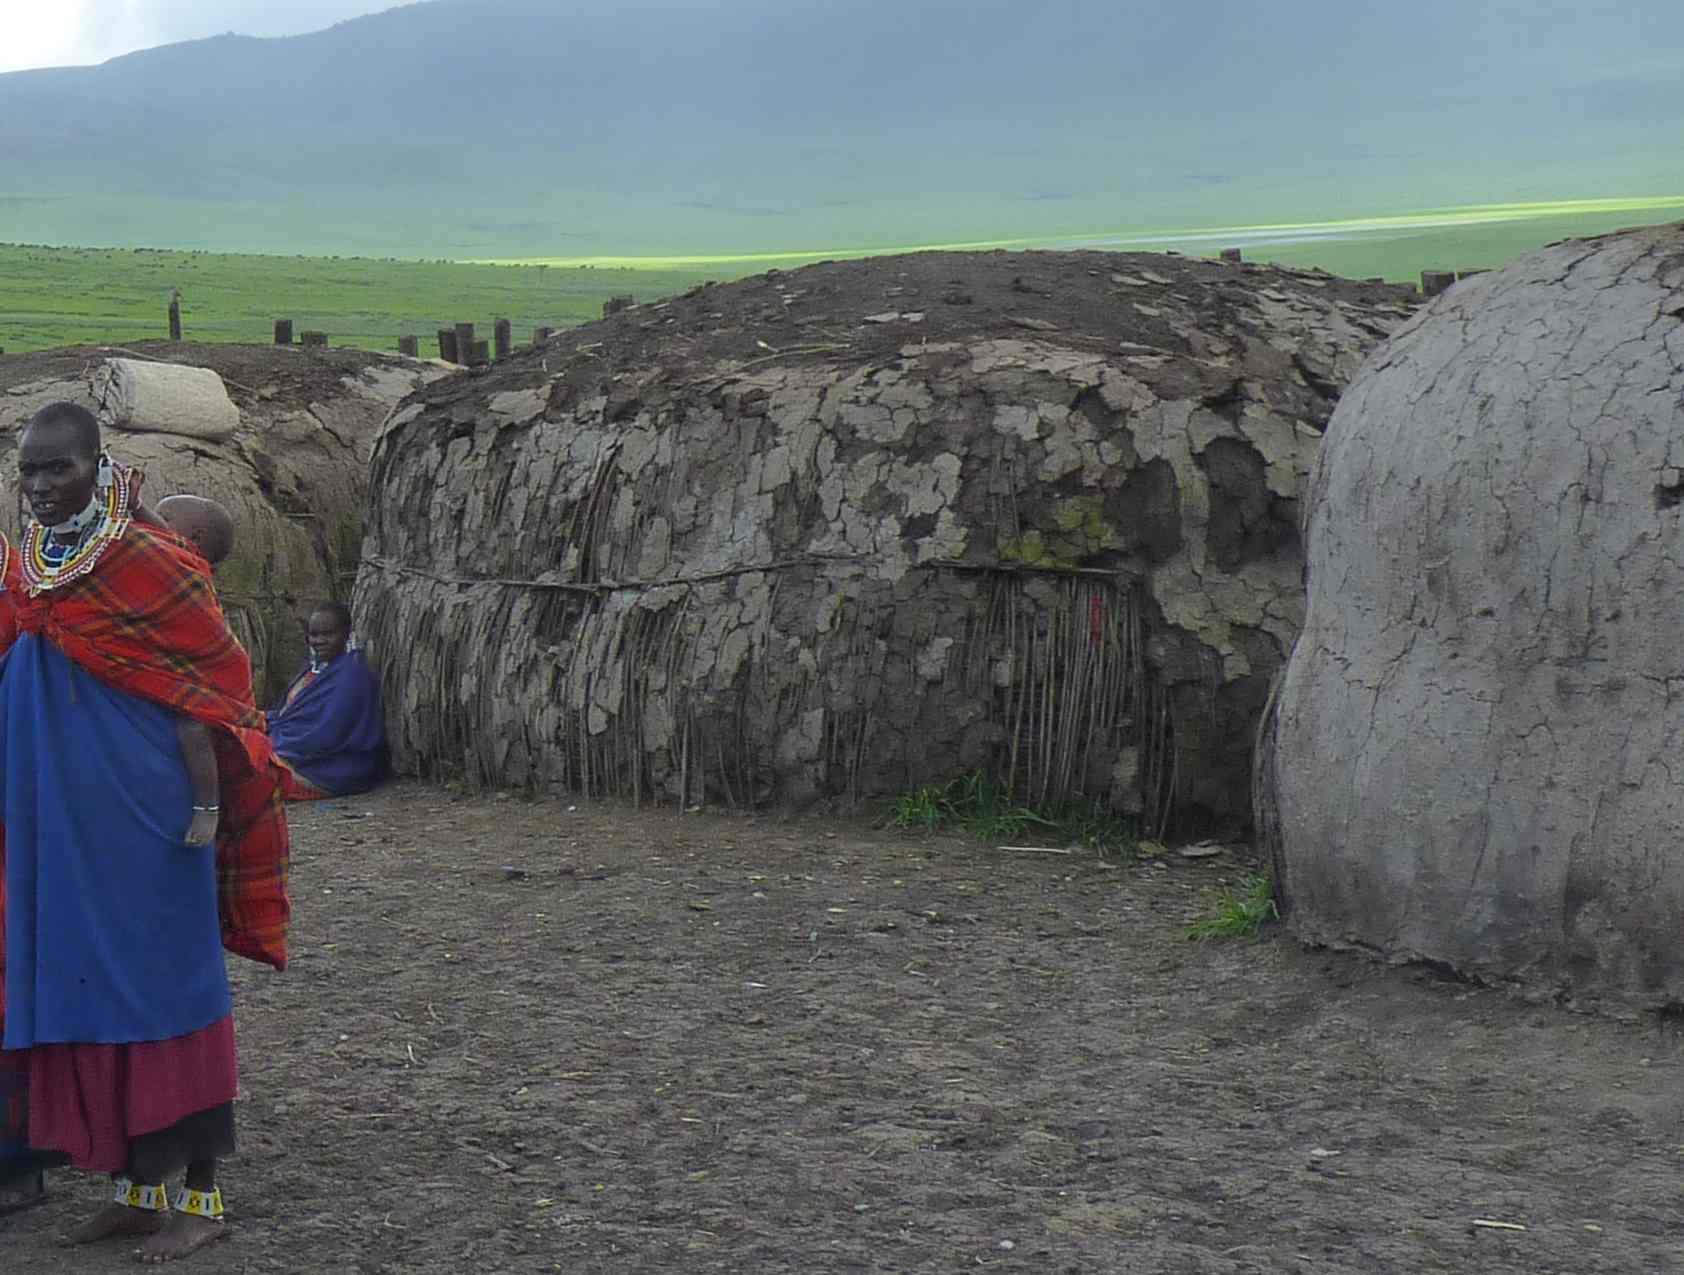 A chacun sa hutte. Massaïs de Tanzanie 2010.